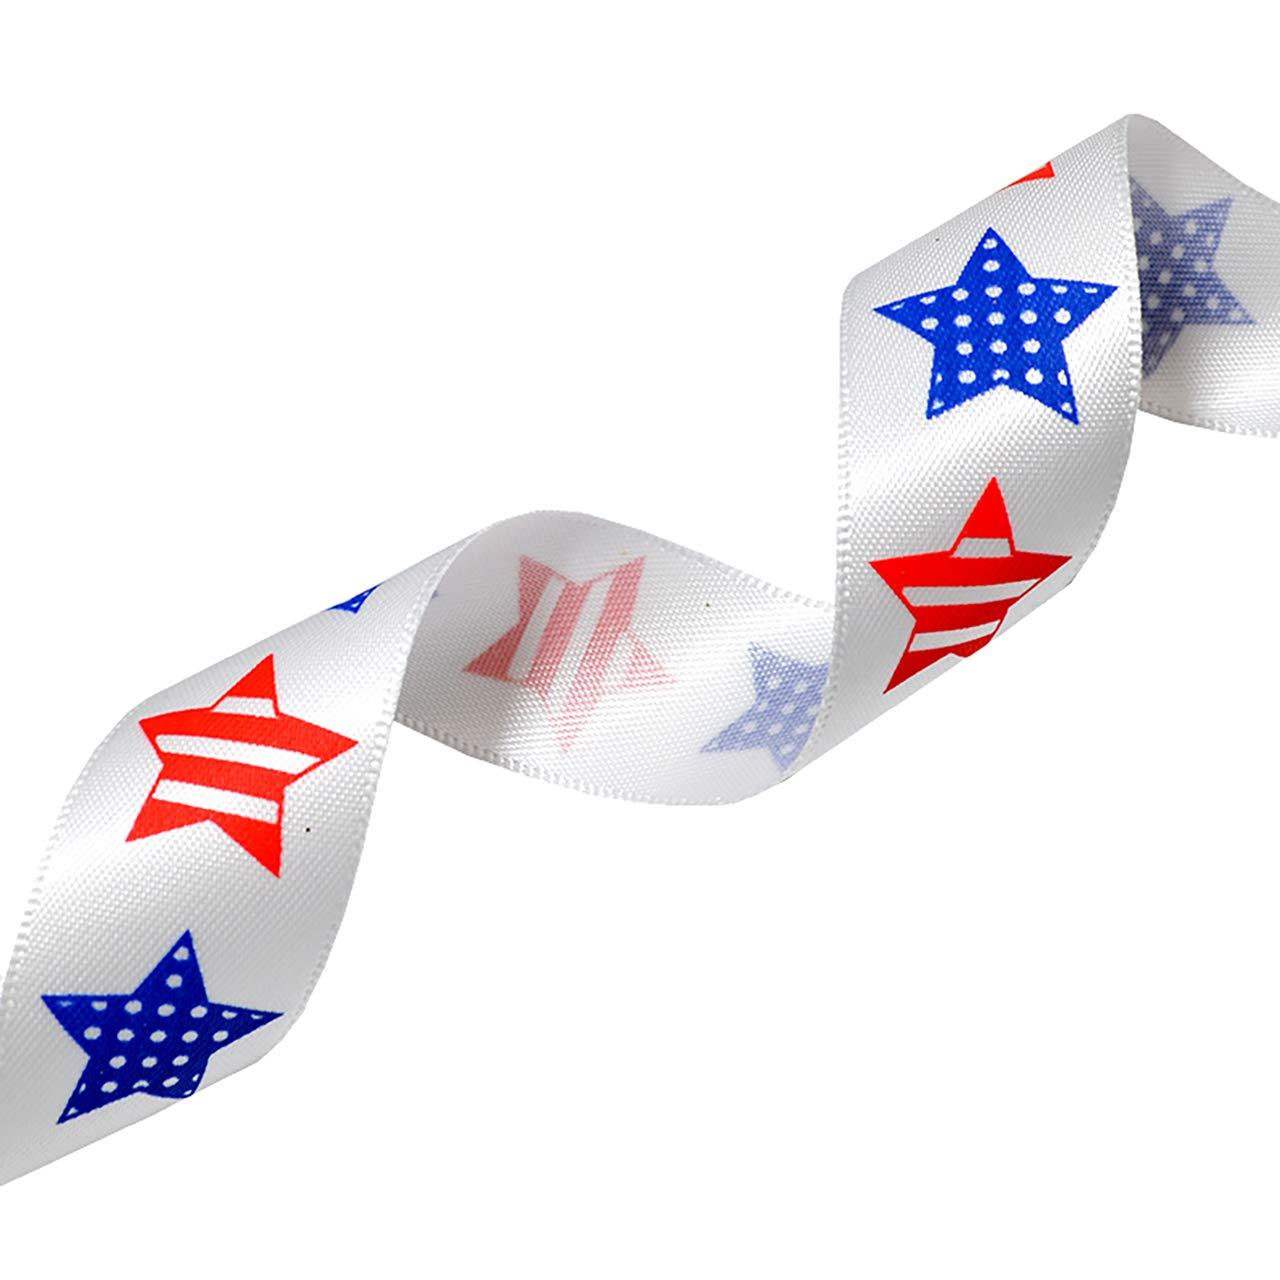 Red//White//Blue Morex Ribbon Betsy Ross Printed Satin Ribbon Spool 3//8-Inch by 5-Yard